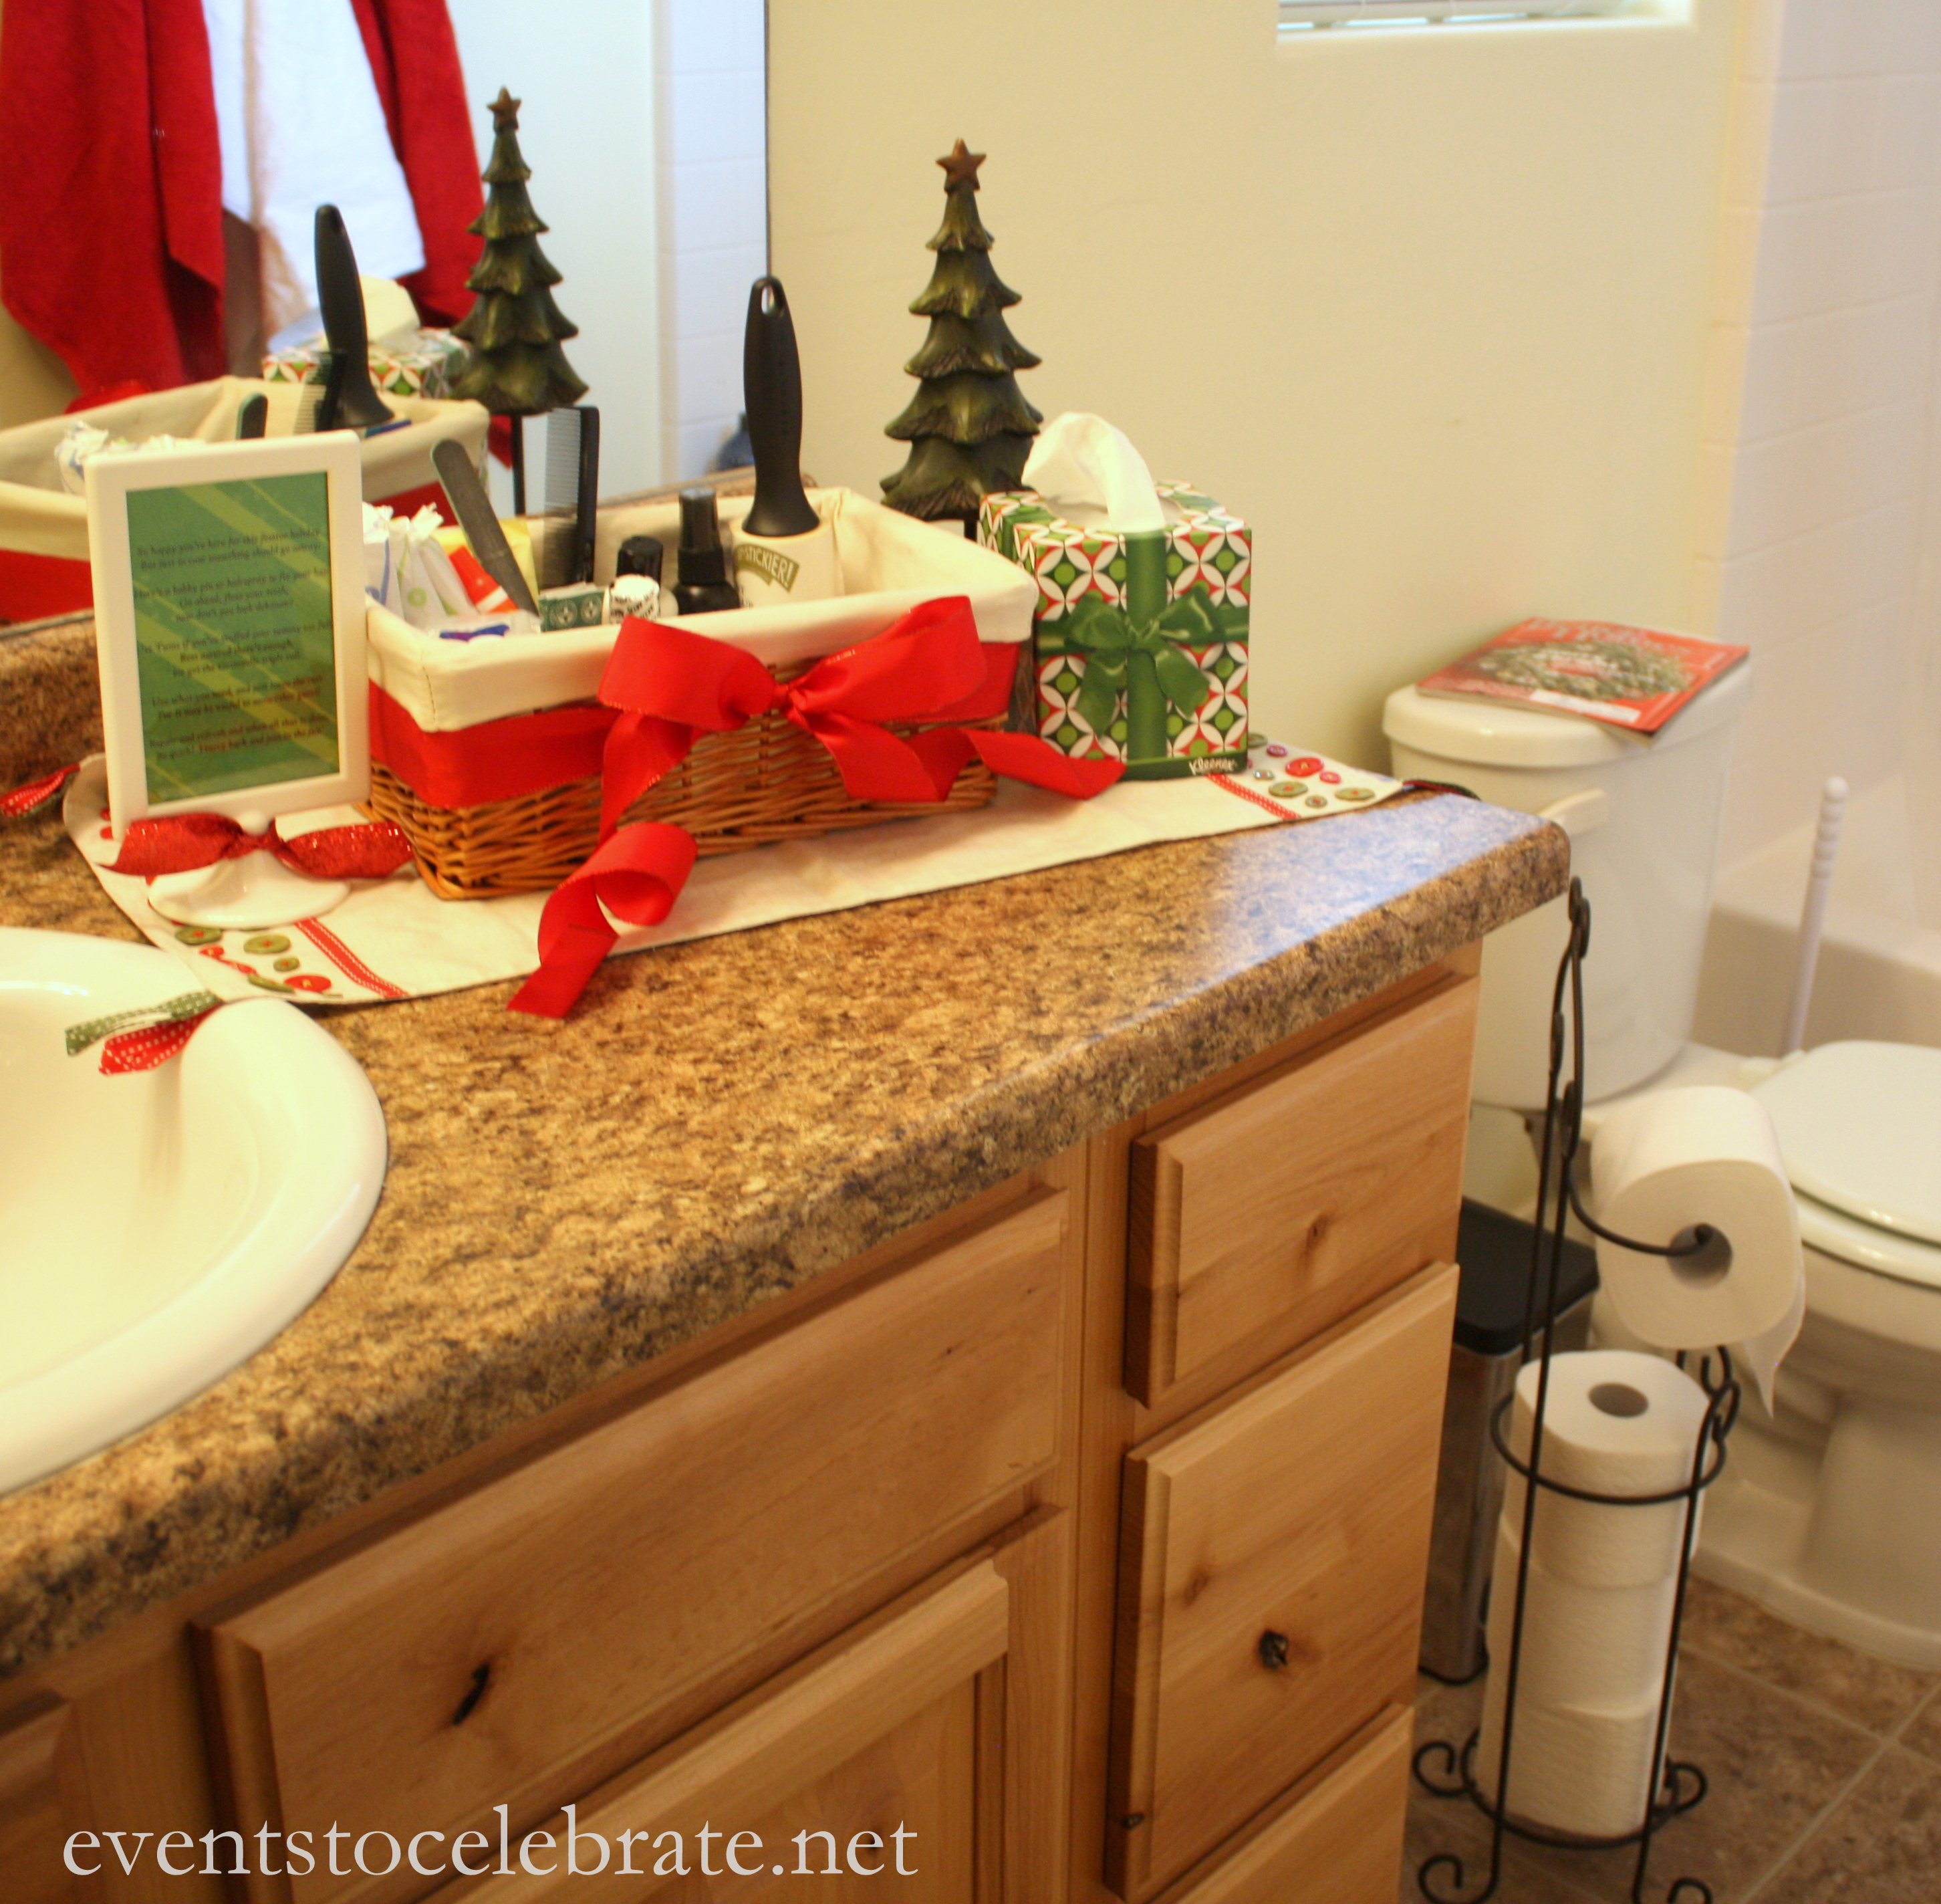 Bathroom Basket - Holiday Entertaining -